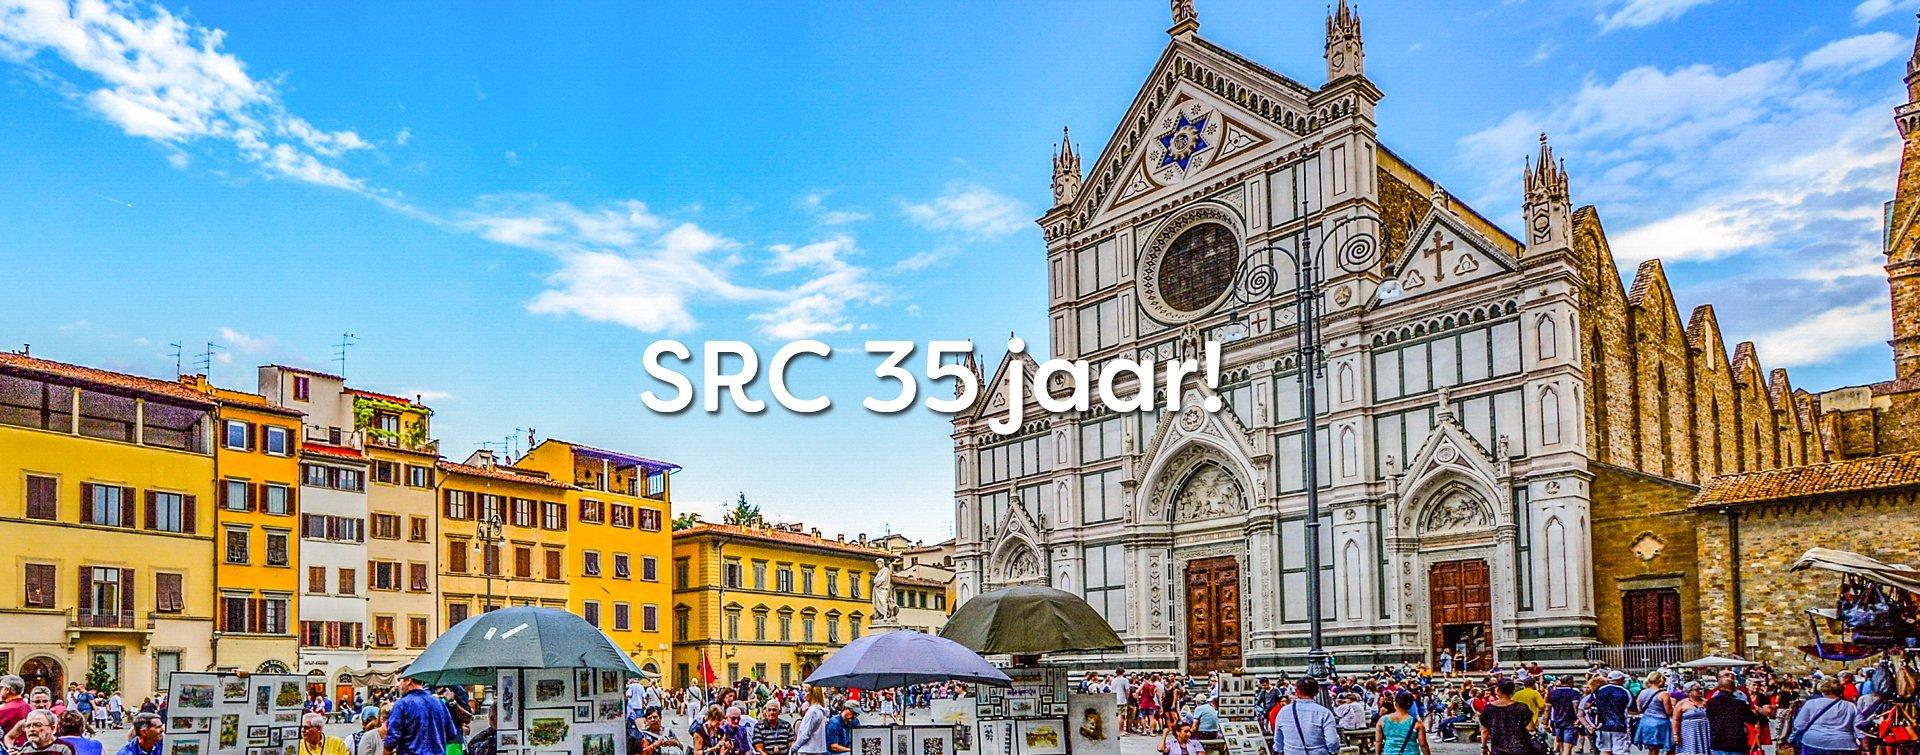 Santa Croce in Florence, Italië